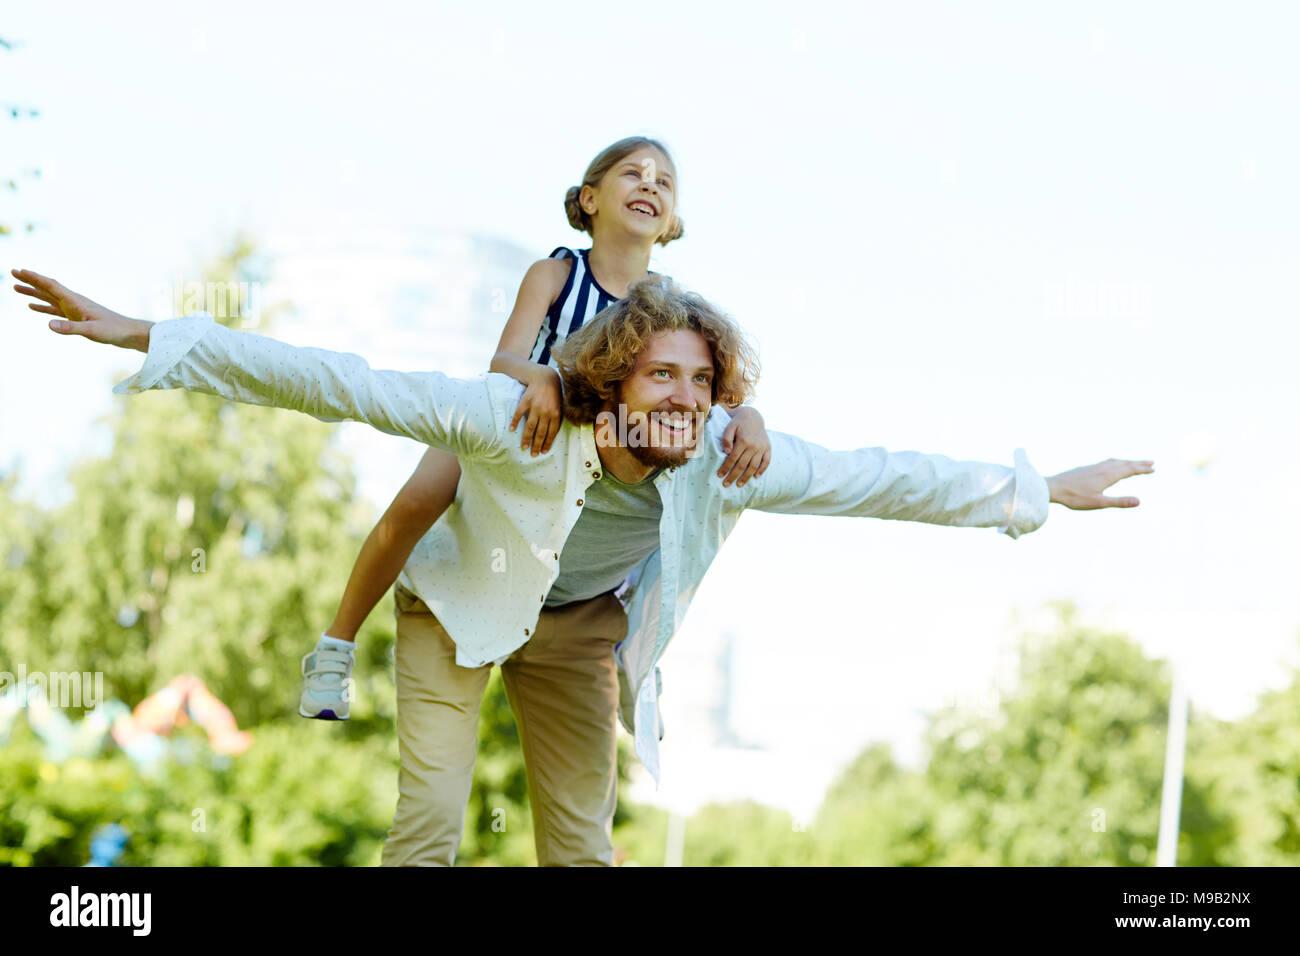 Enjoying summer - Stock Image